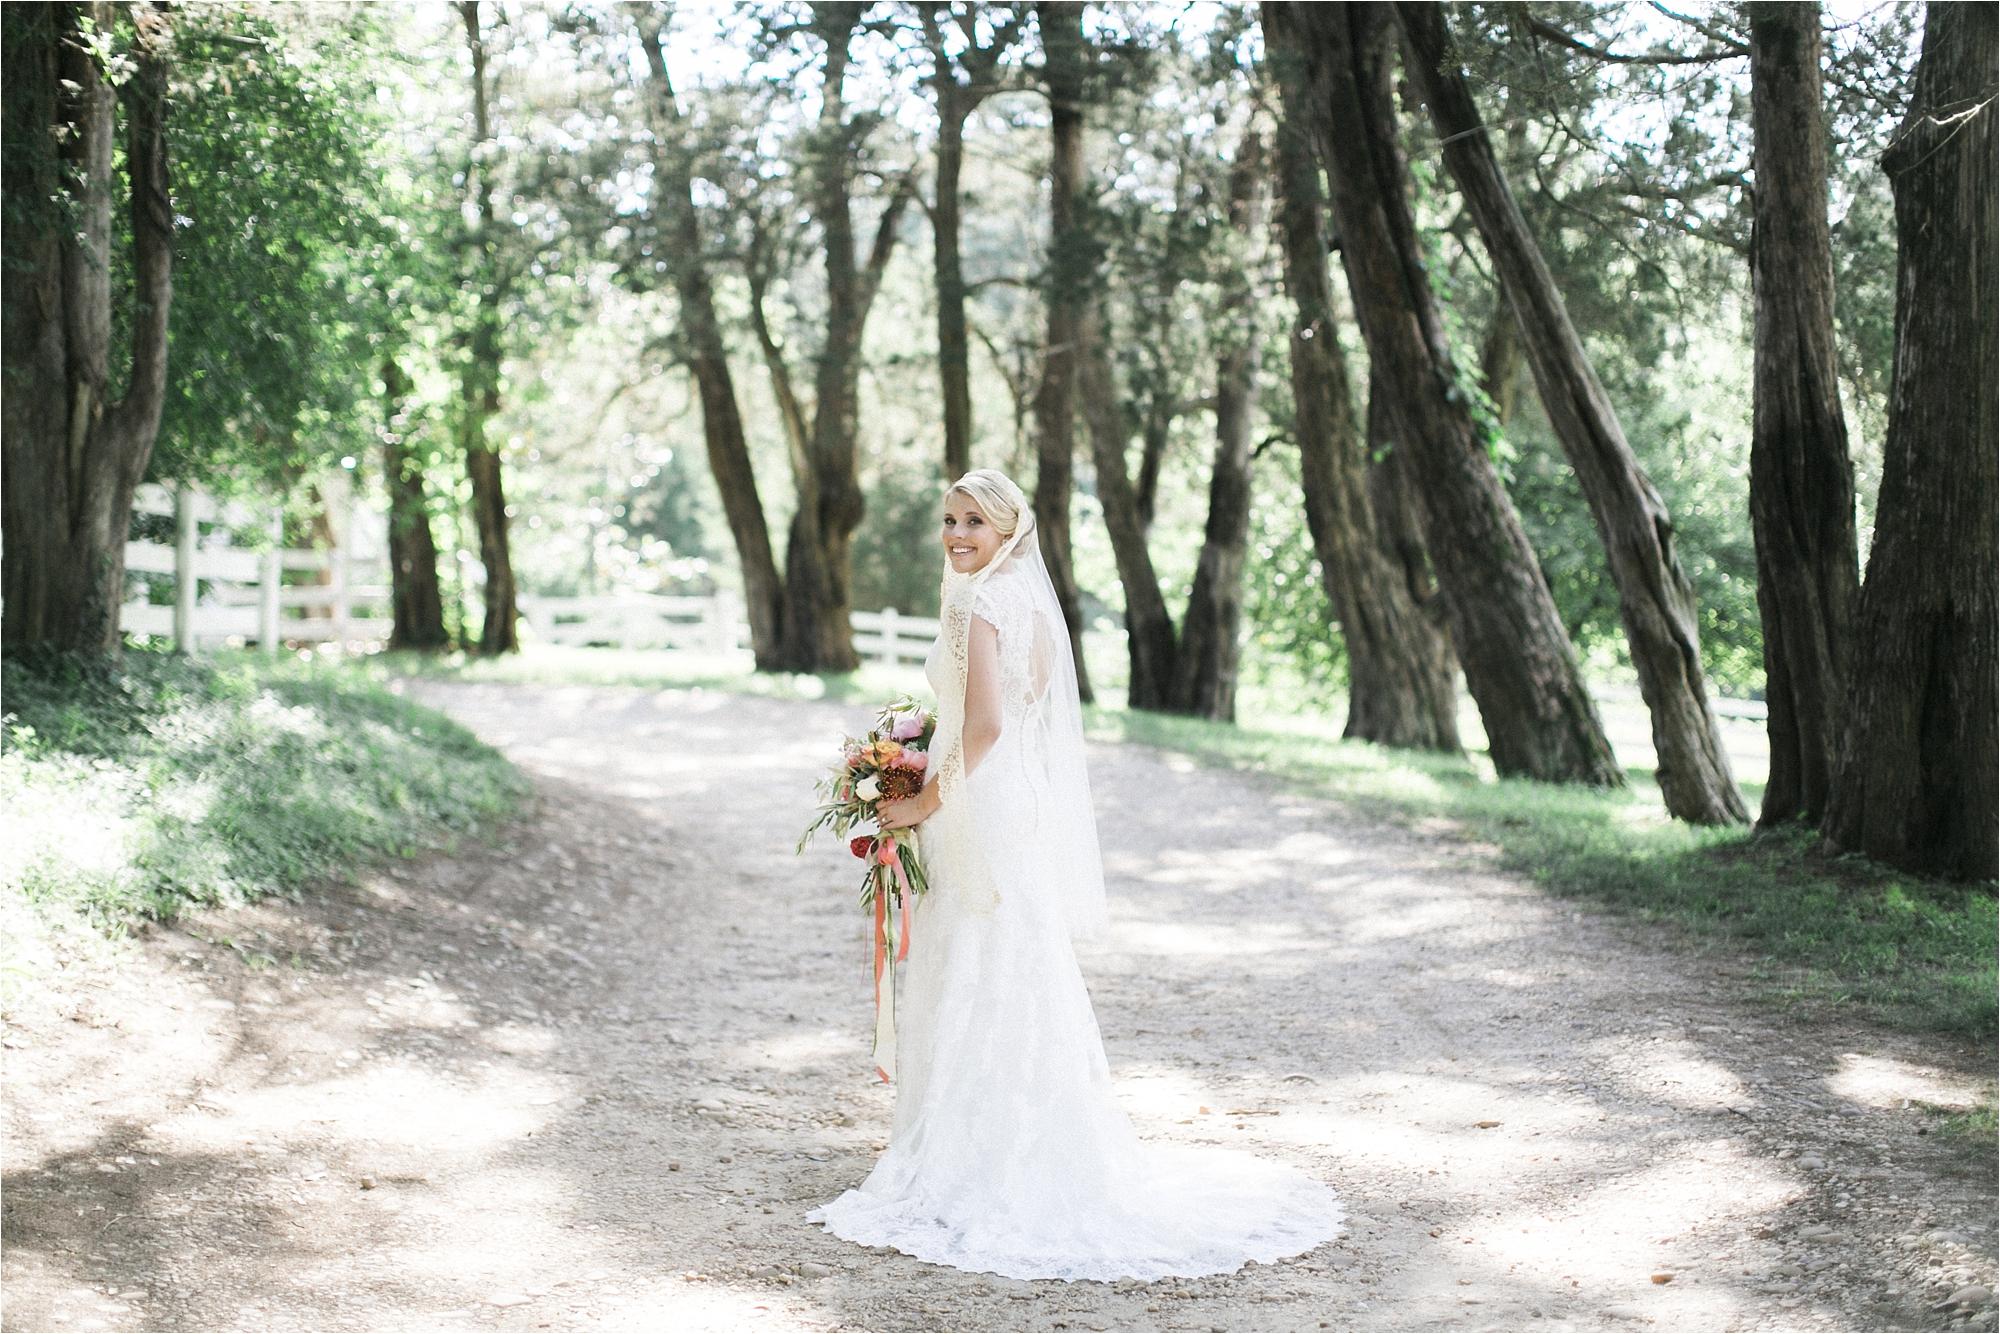 richmond-virginia-tuckahoe-plantation-coral-summer-wedding-stephanie-yonce-photos_0013a.JPG